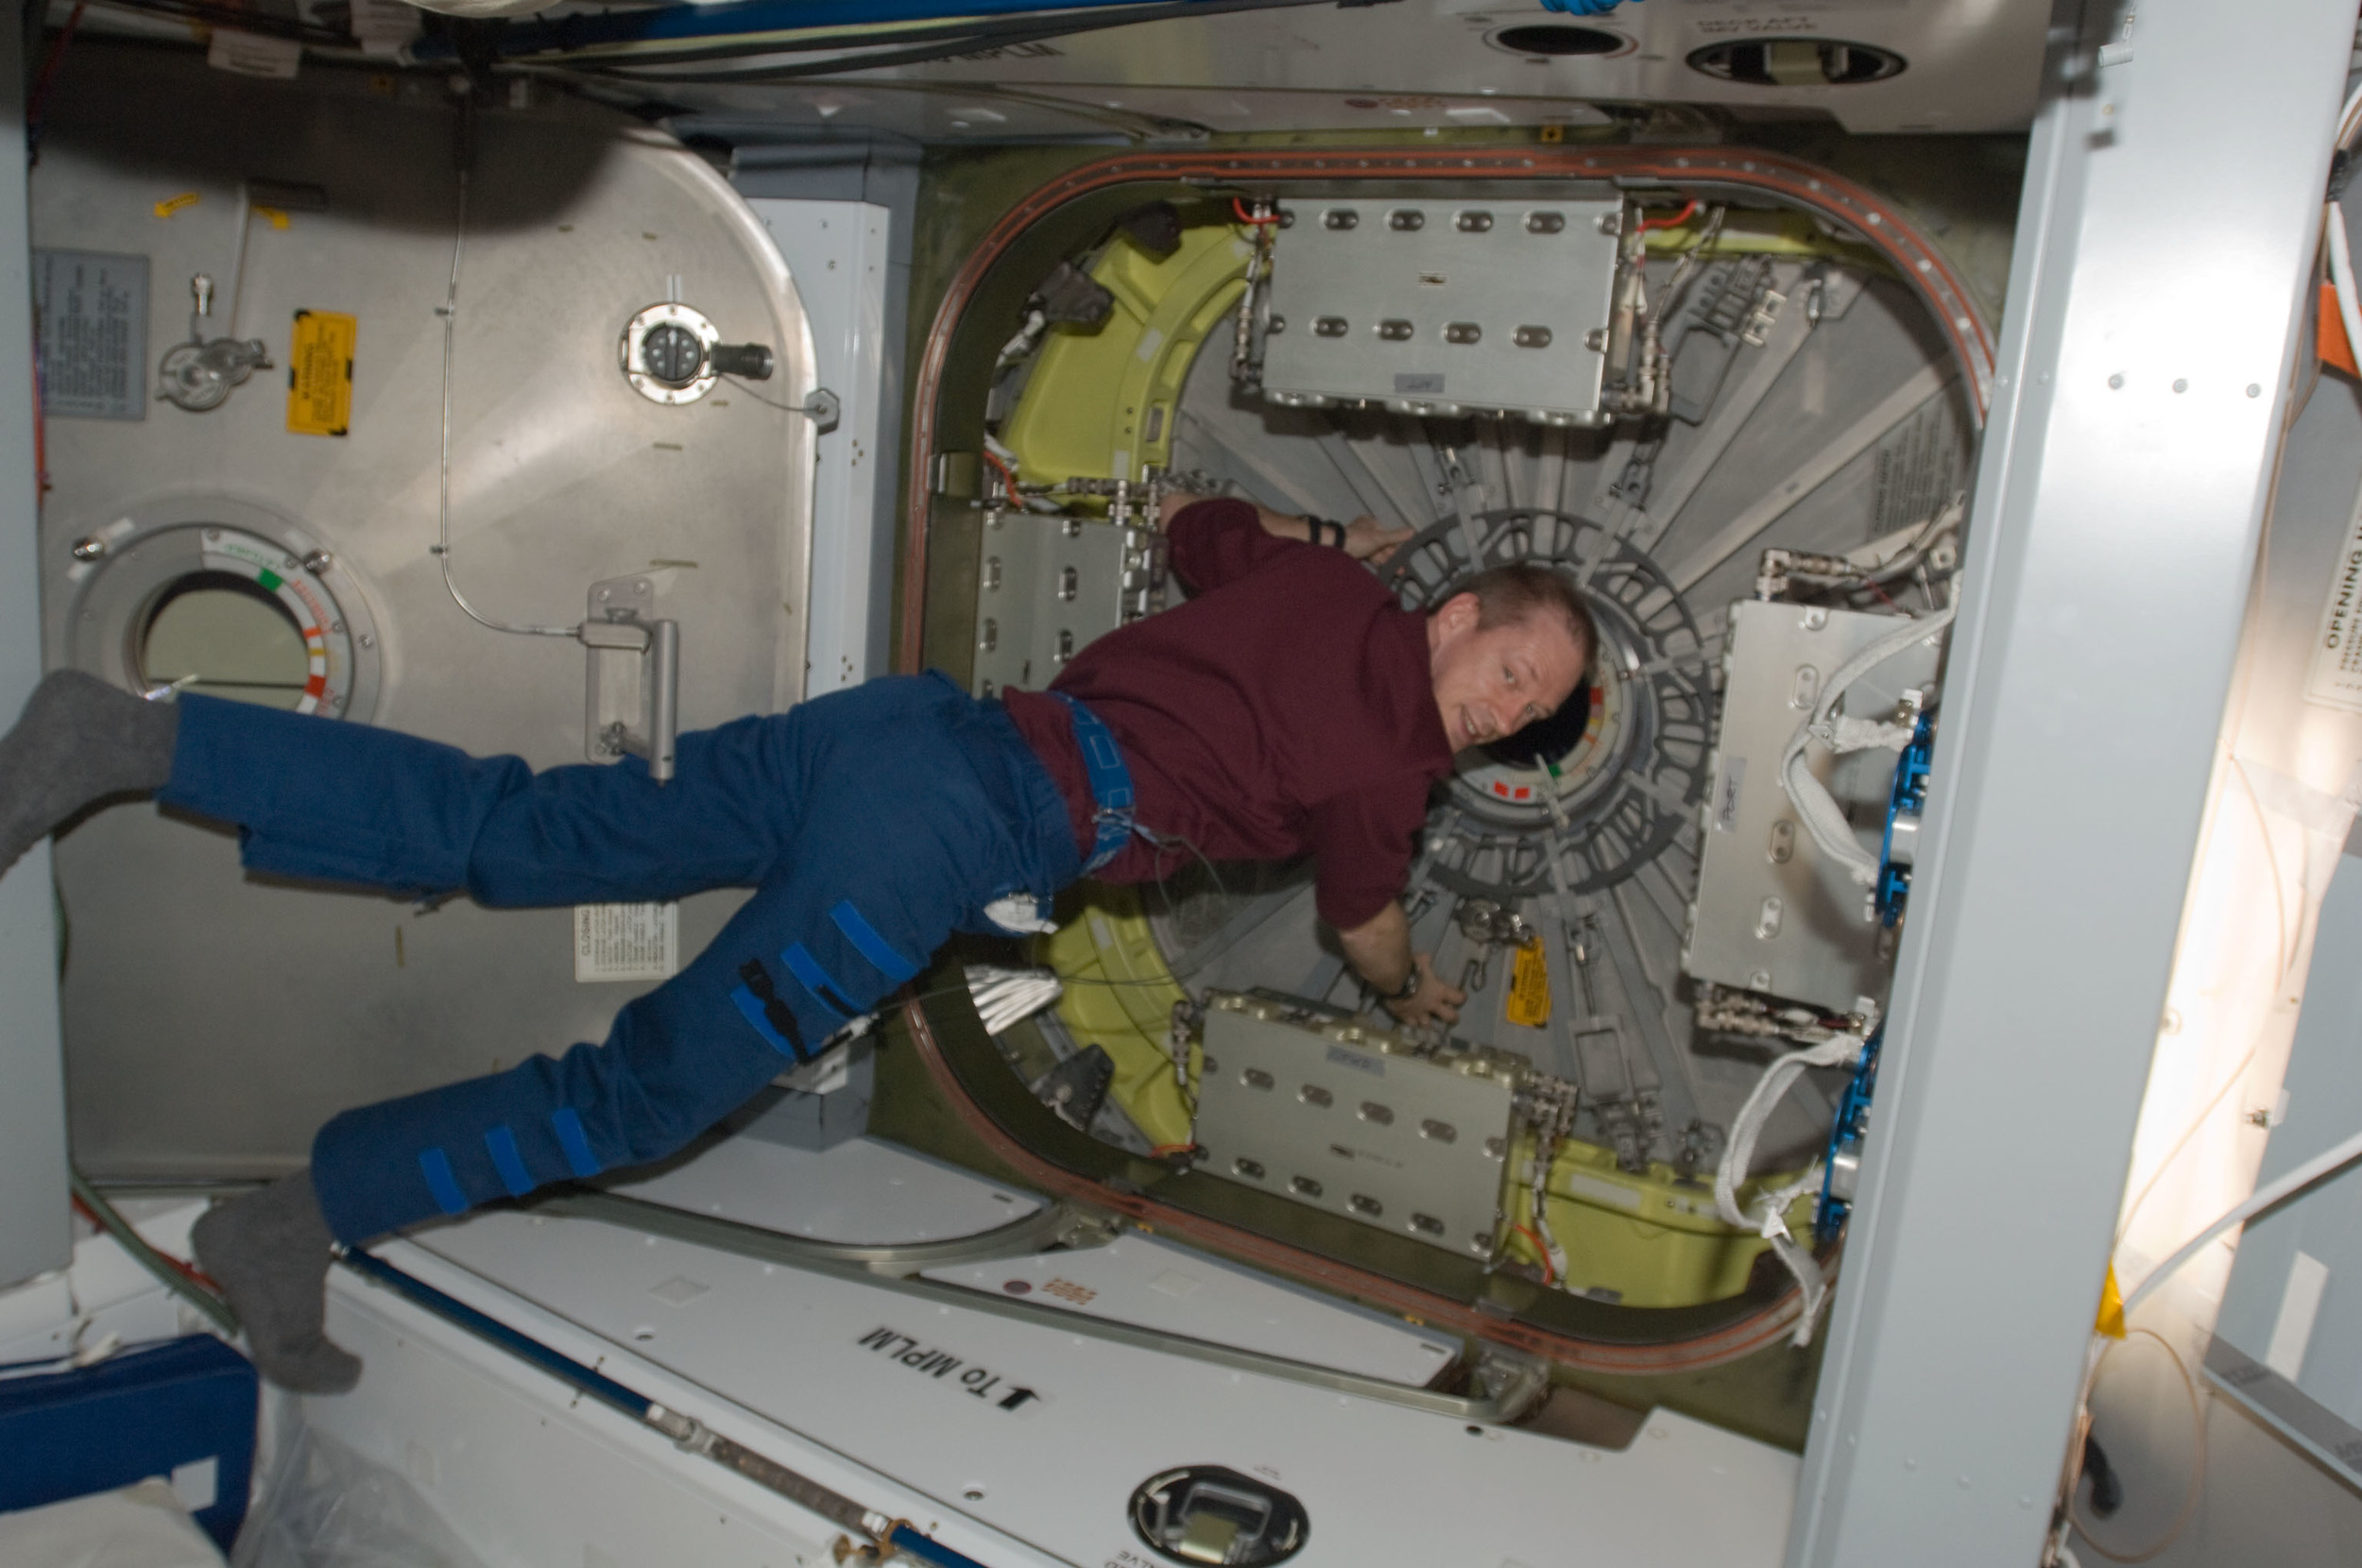 Belgium astronaut Frank De Winne prepares to open the Kounotori's hatch. Photo Credit: NASA